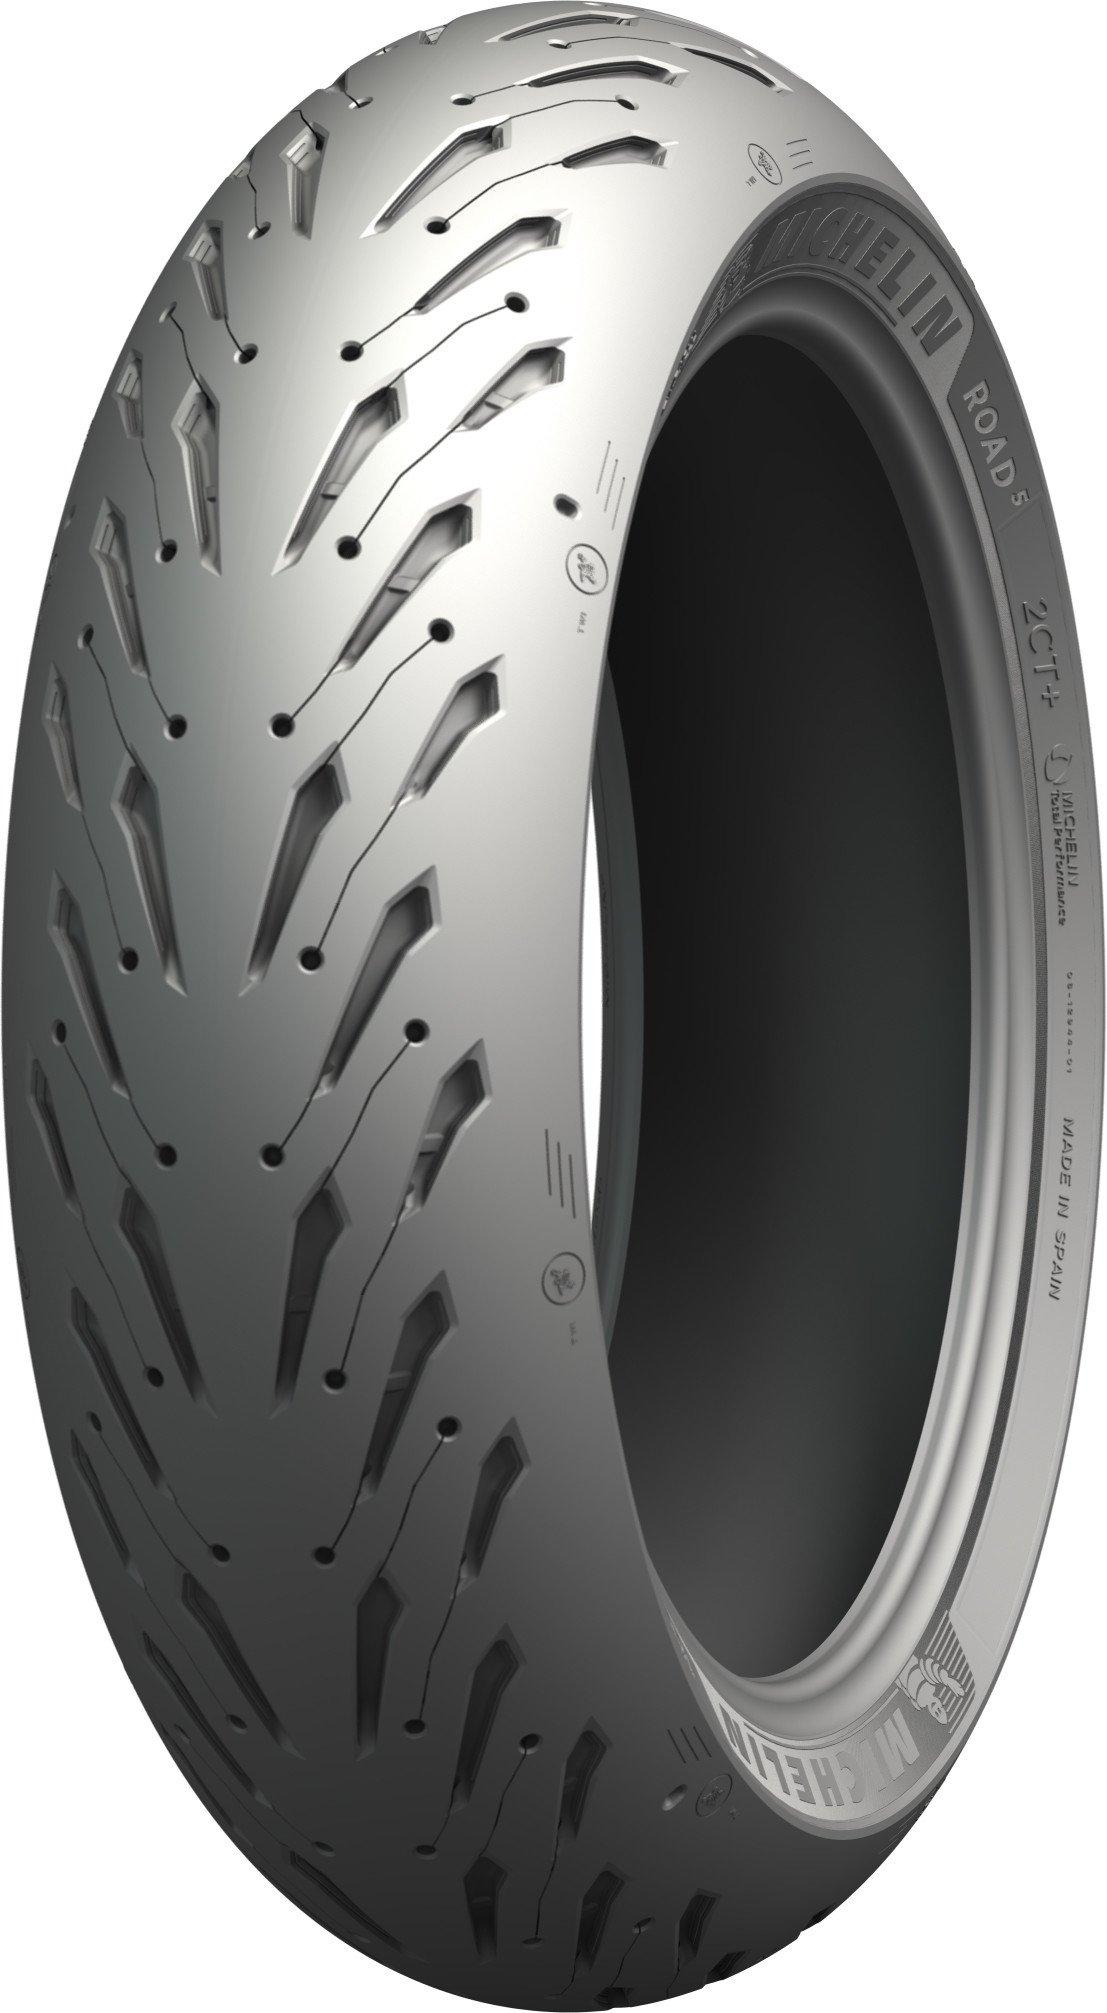 Tire Road 5 Rear 190 50 Zr17 73w Radial Tl Os Michelin 88786 Michelin Tire Trail Motorcycle